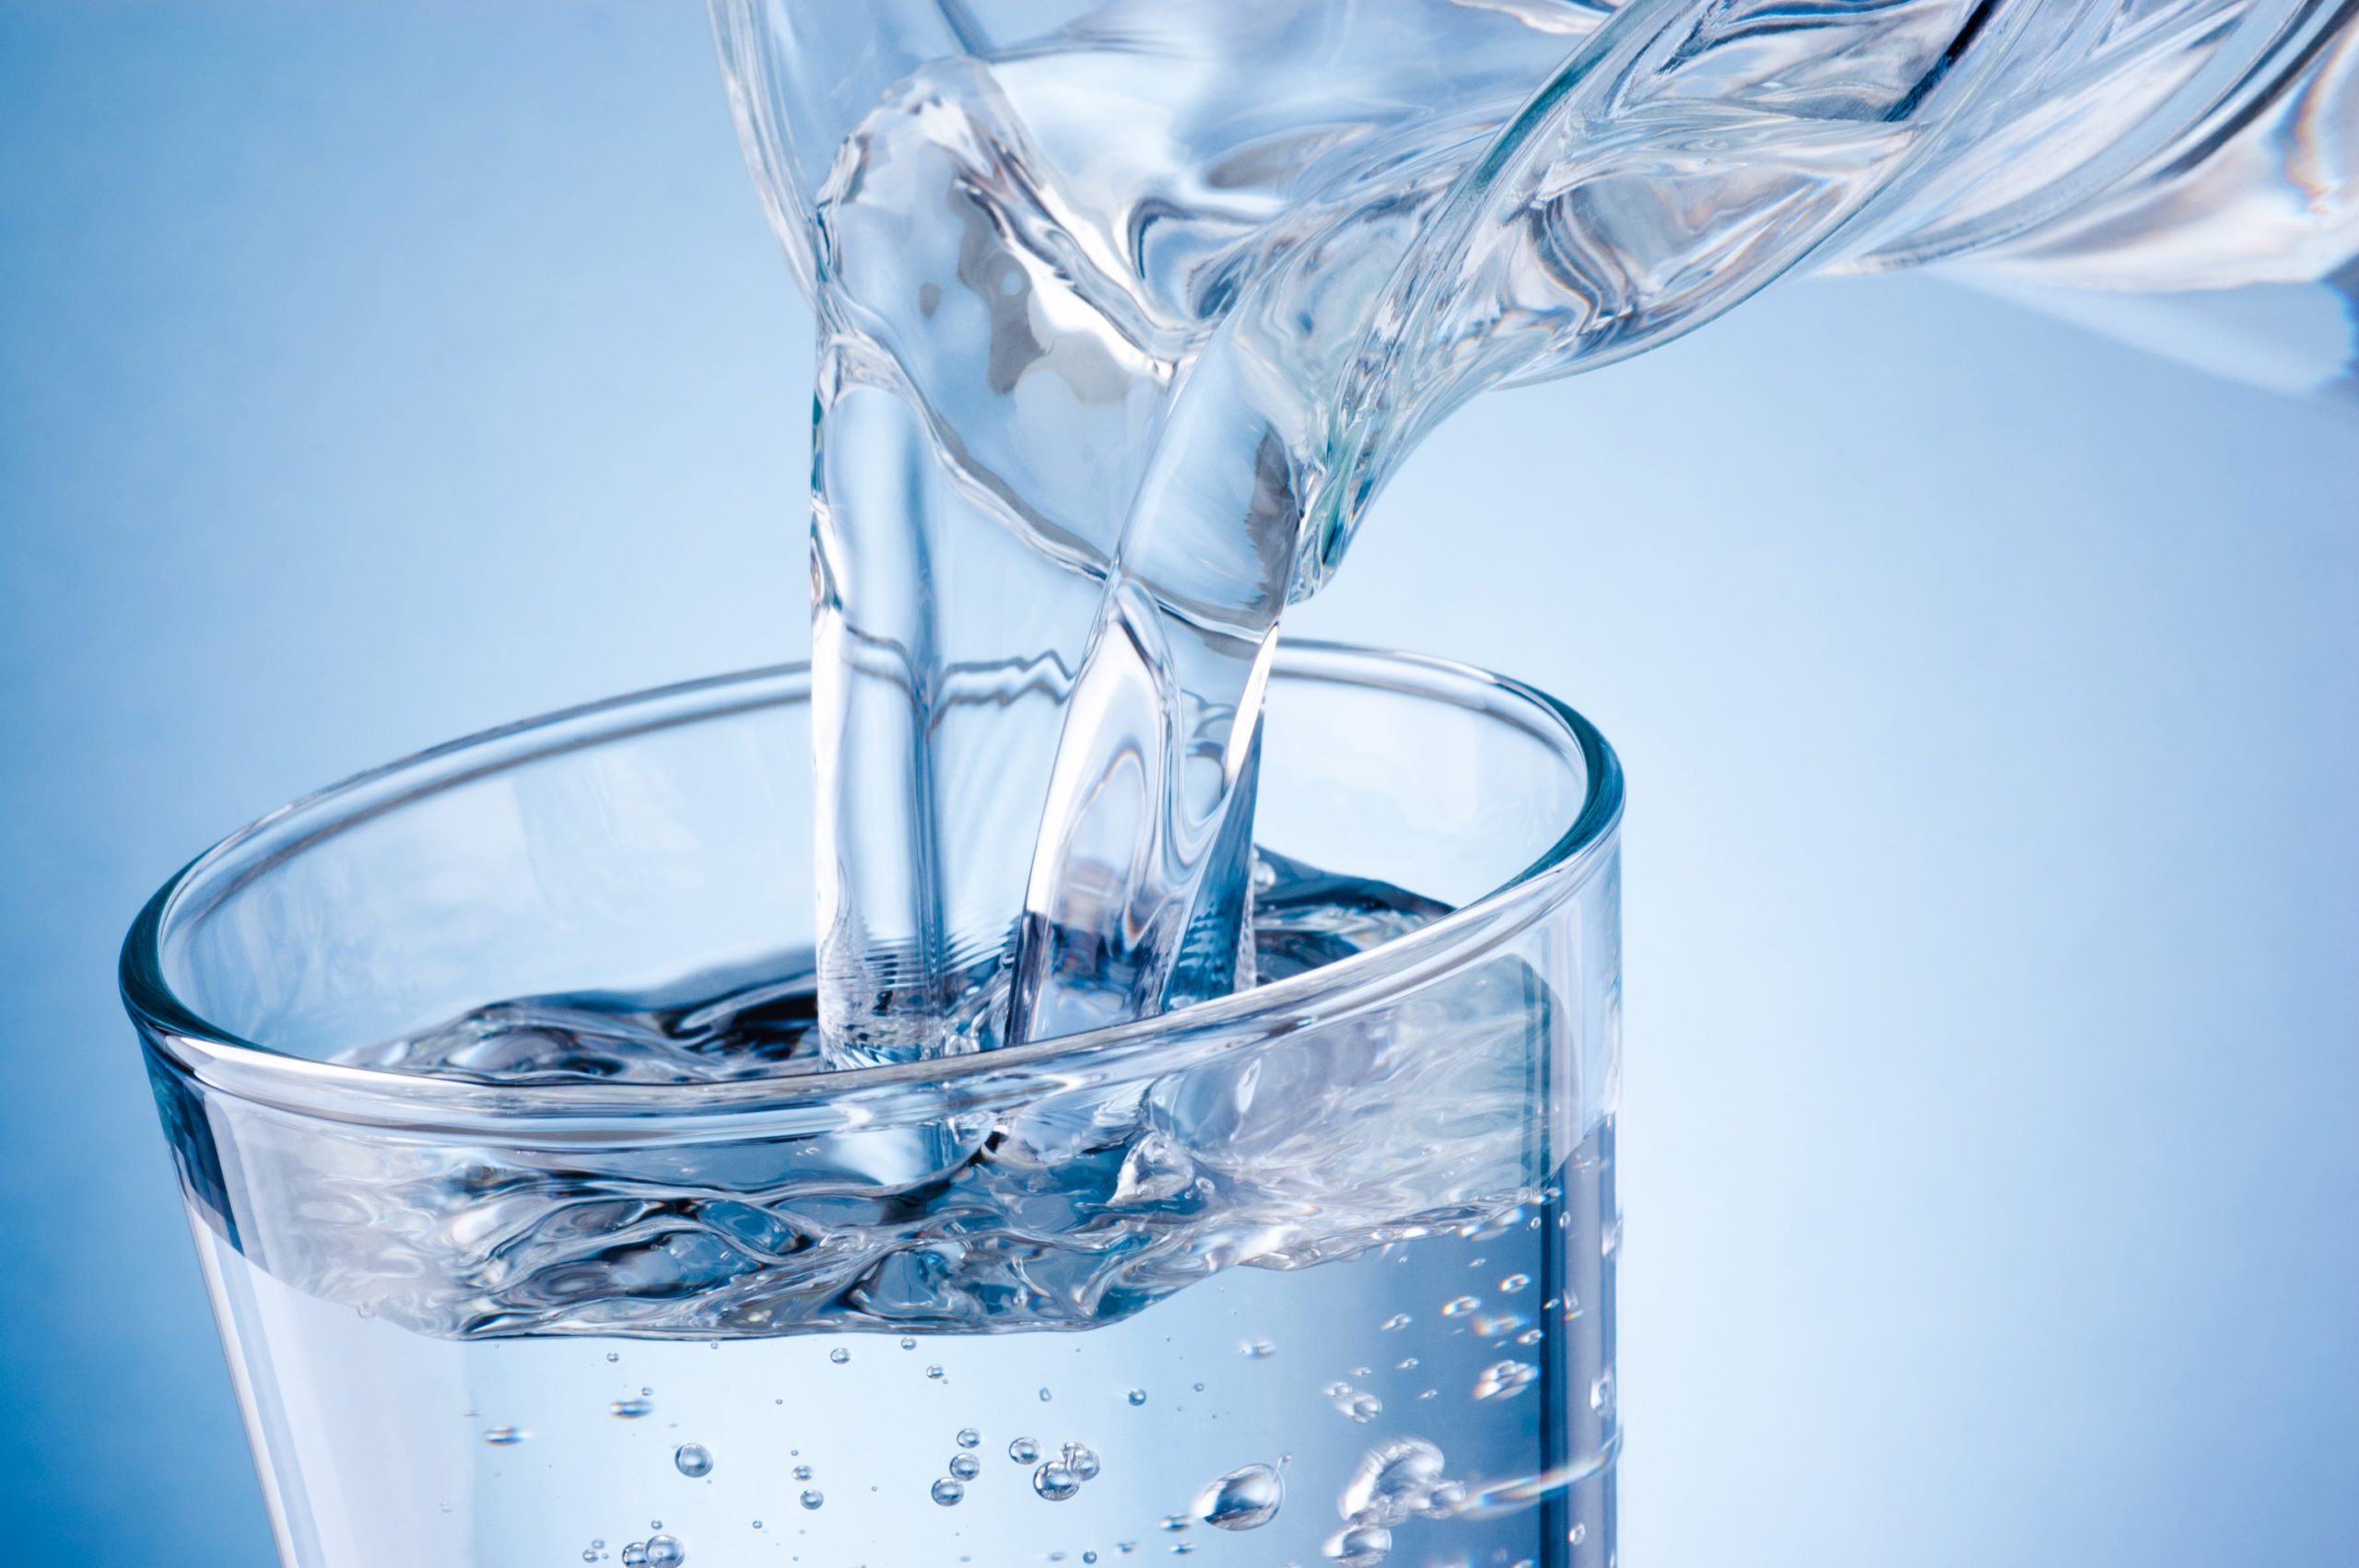 Millenia water